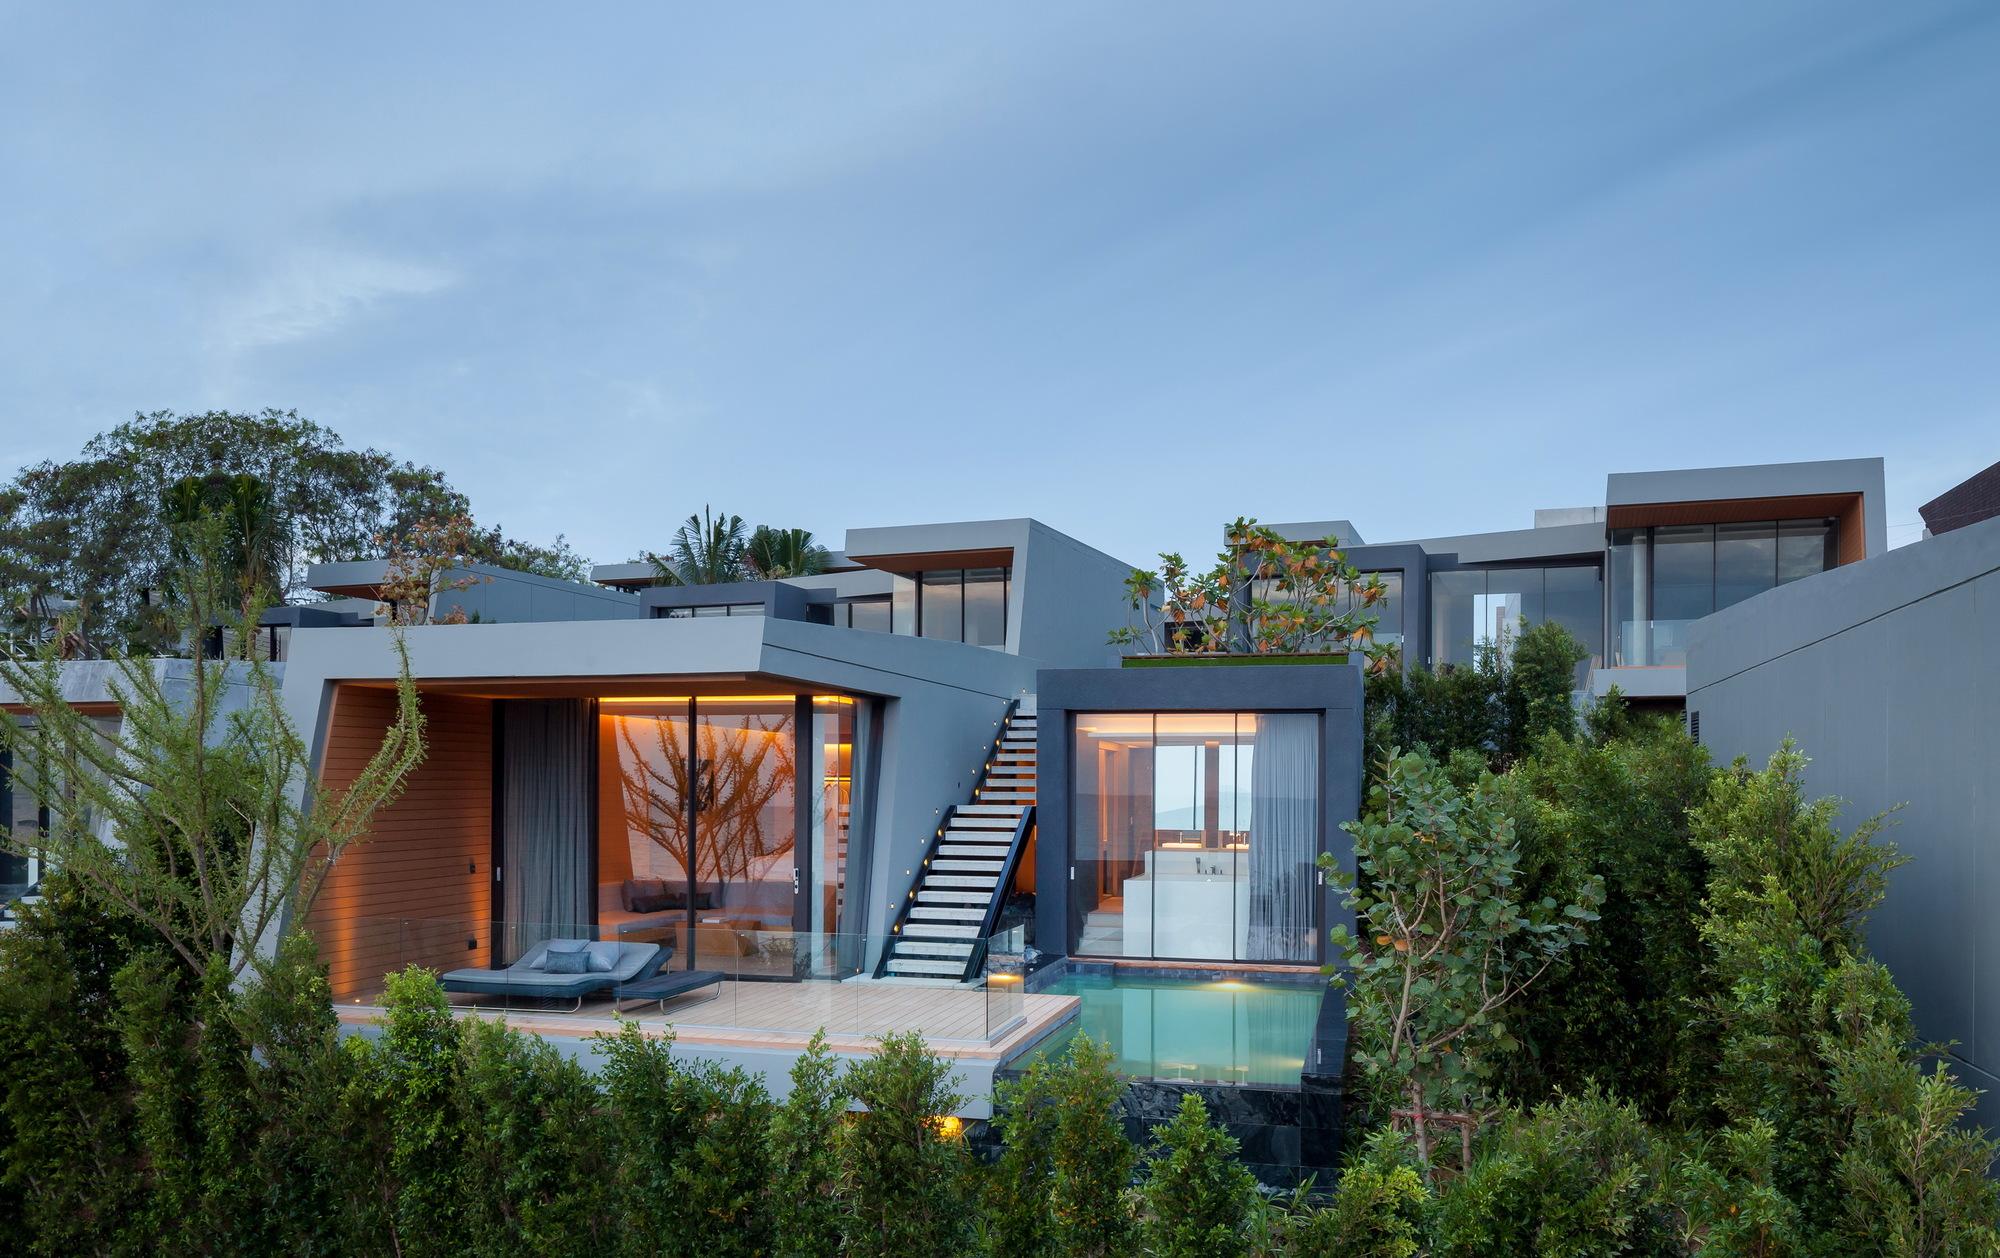 Mason Resort / VaSLab Architecture